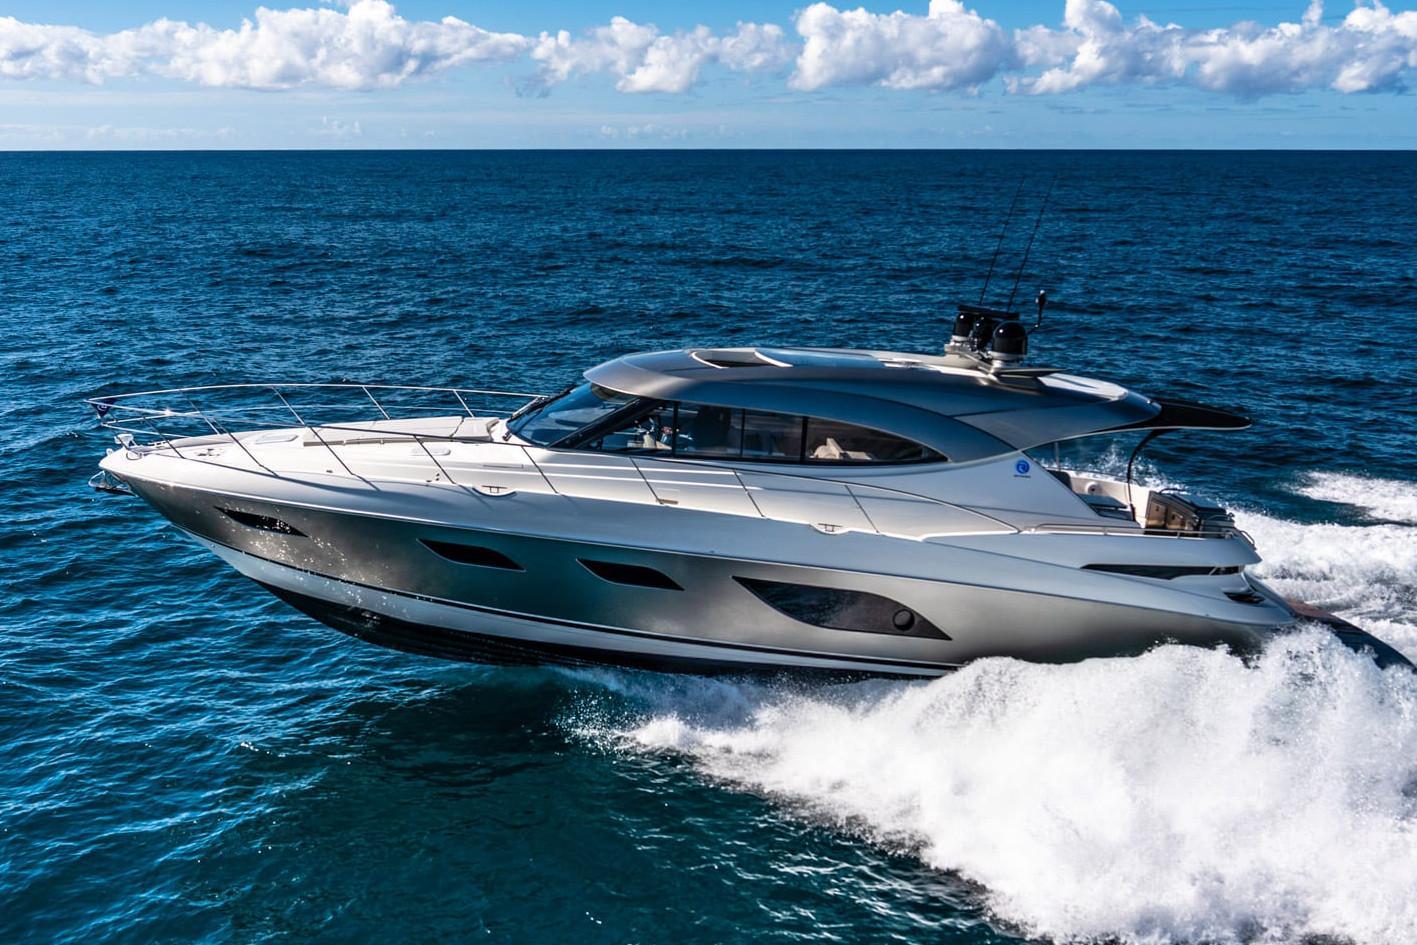 Riviera Boat image